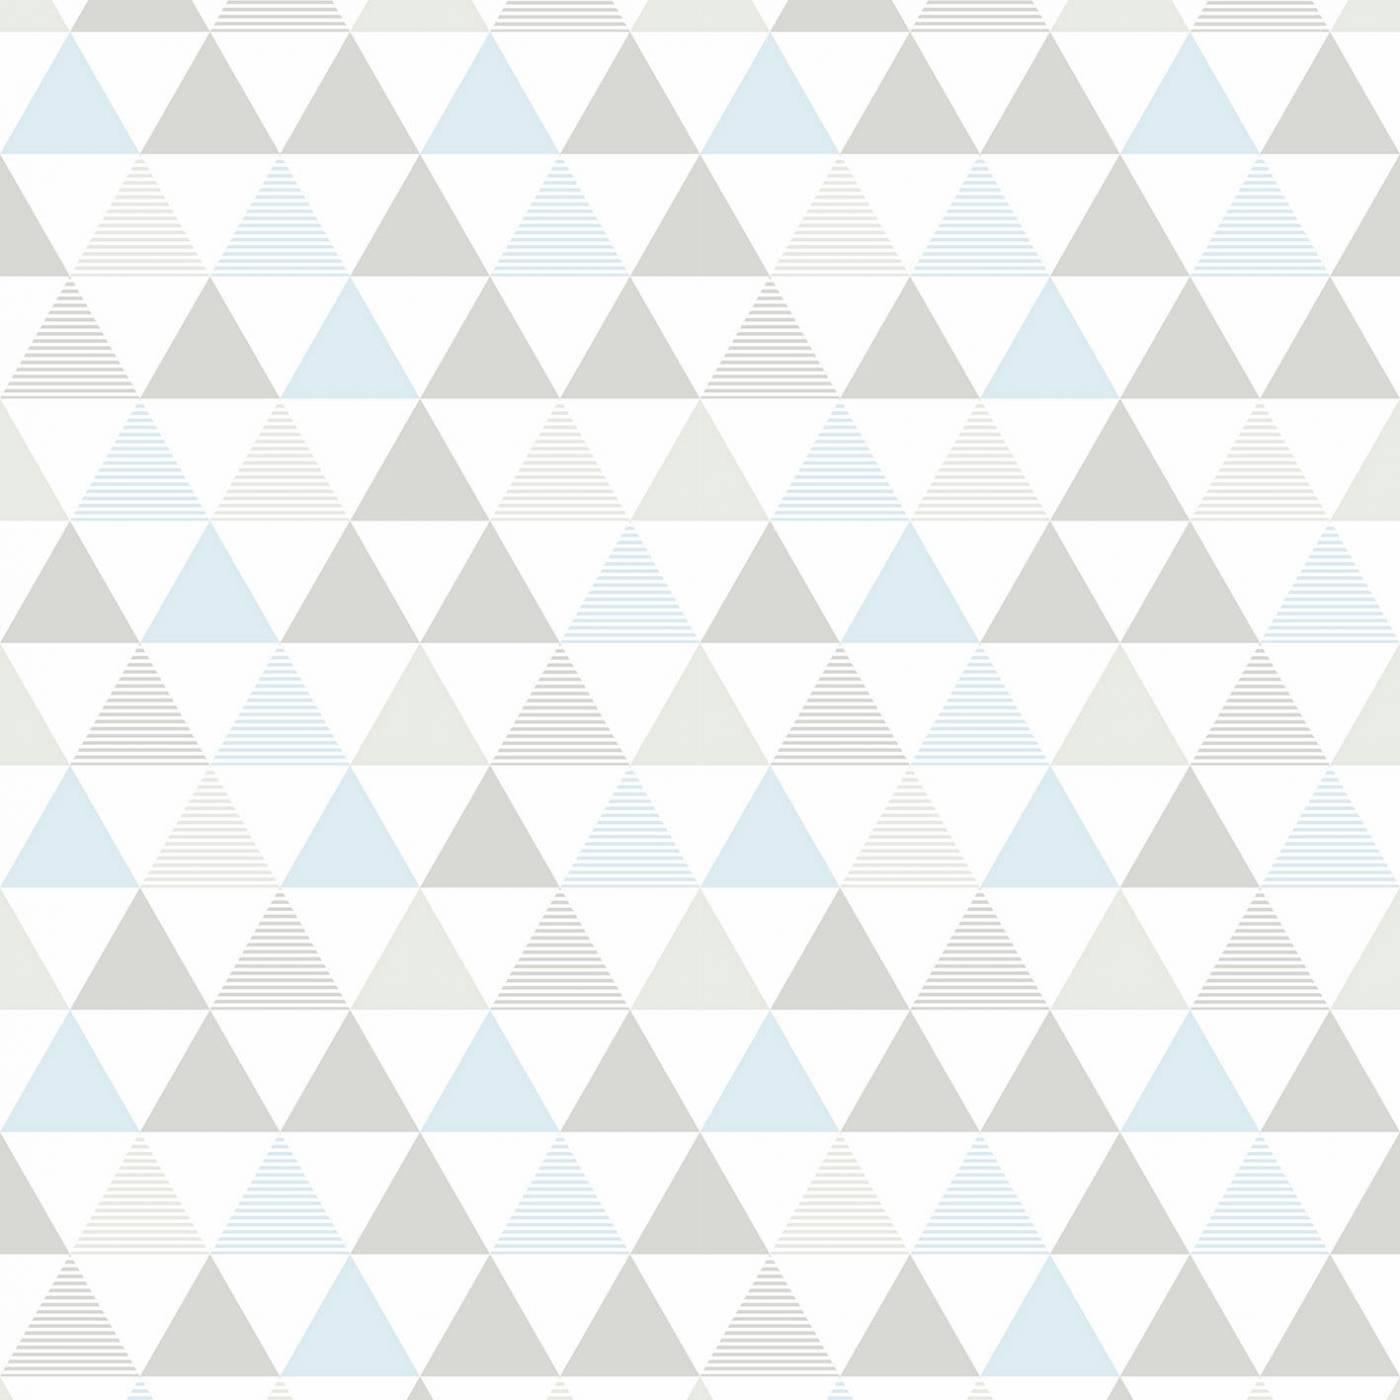 Papel de Parede Triangulo Cinza e Azul